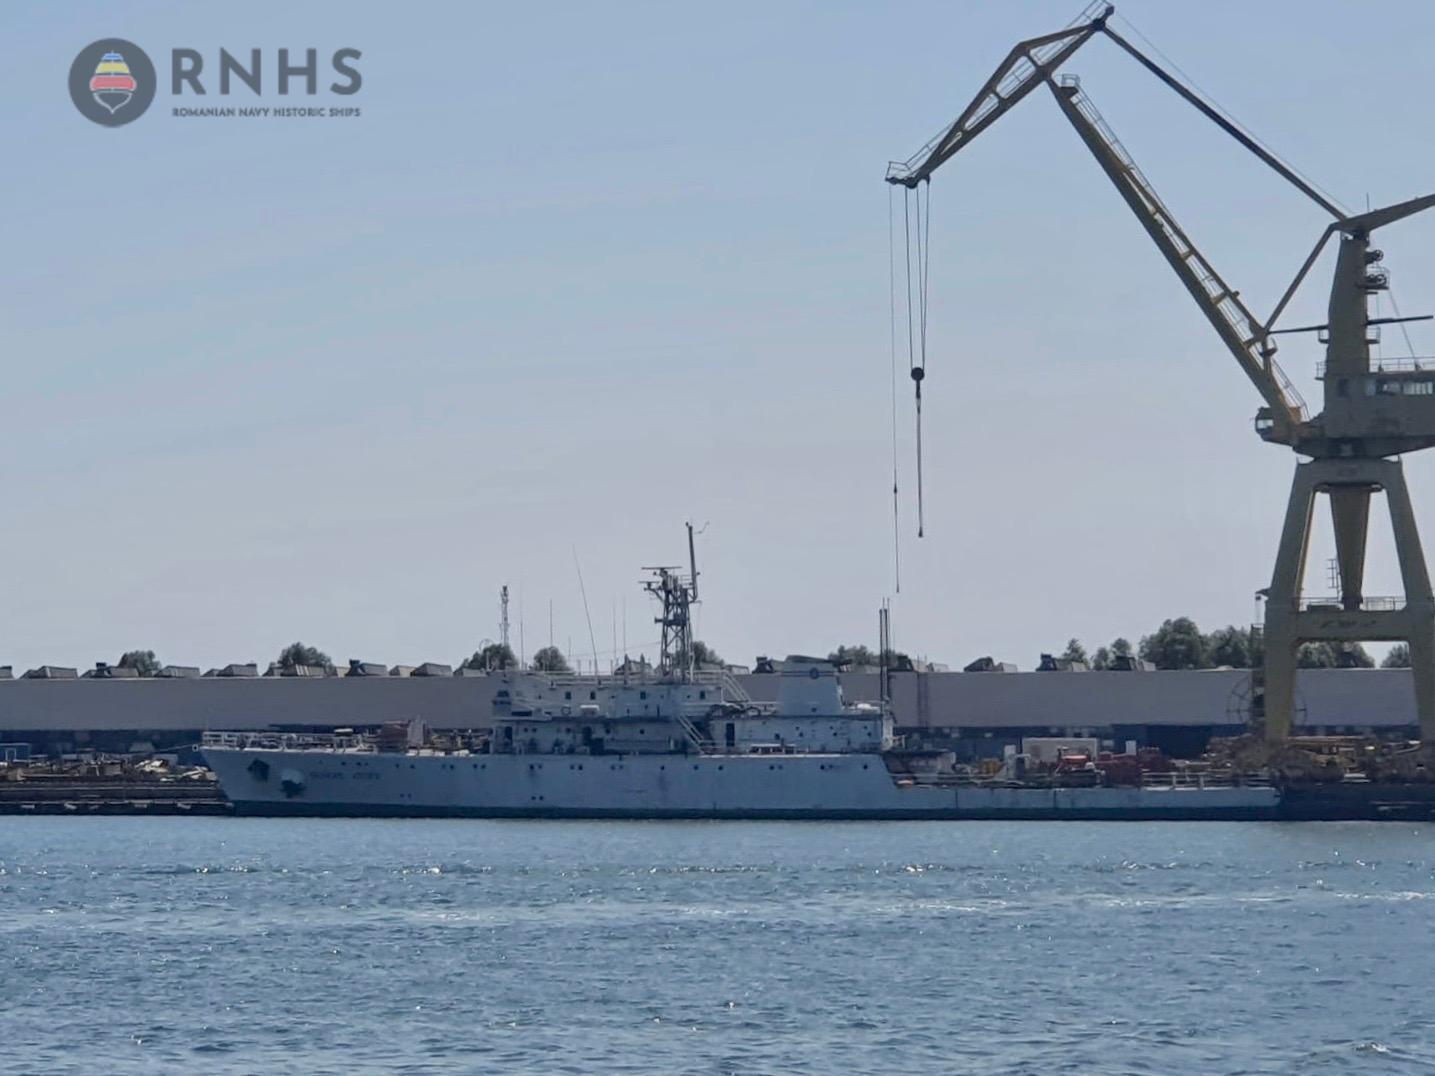 licitatie de modernizare a navei de cercetari marine si scafandri Grigore Antipa